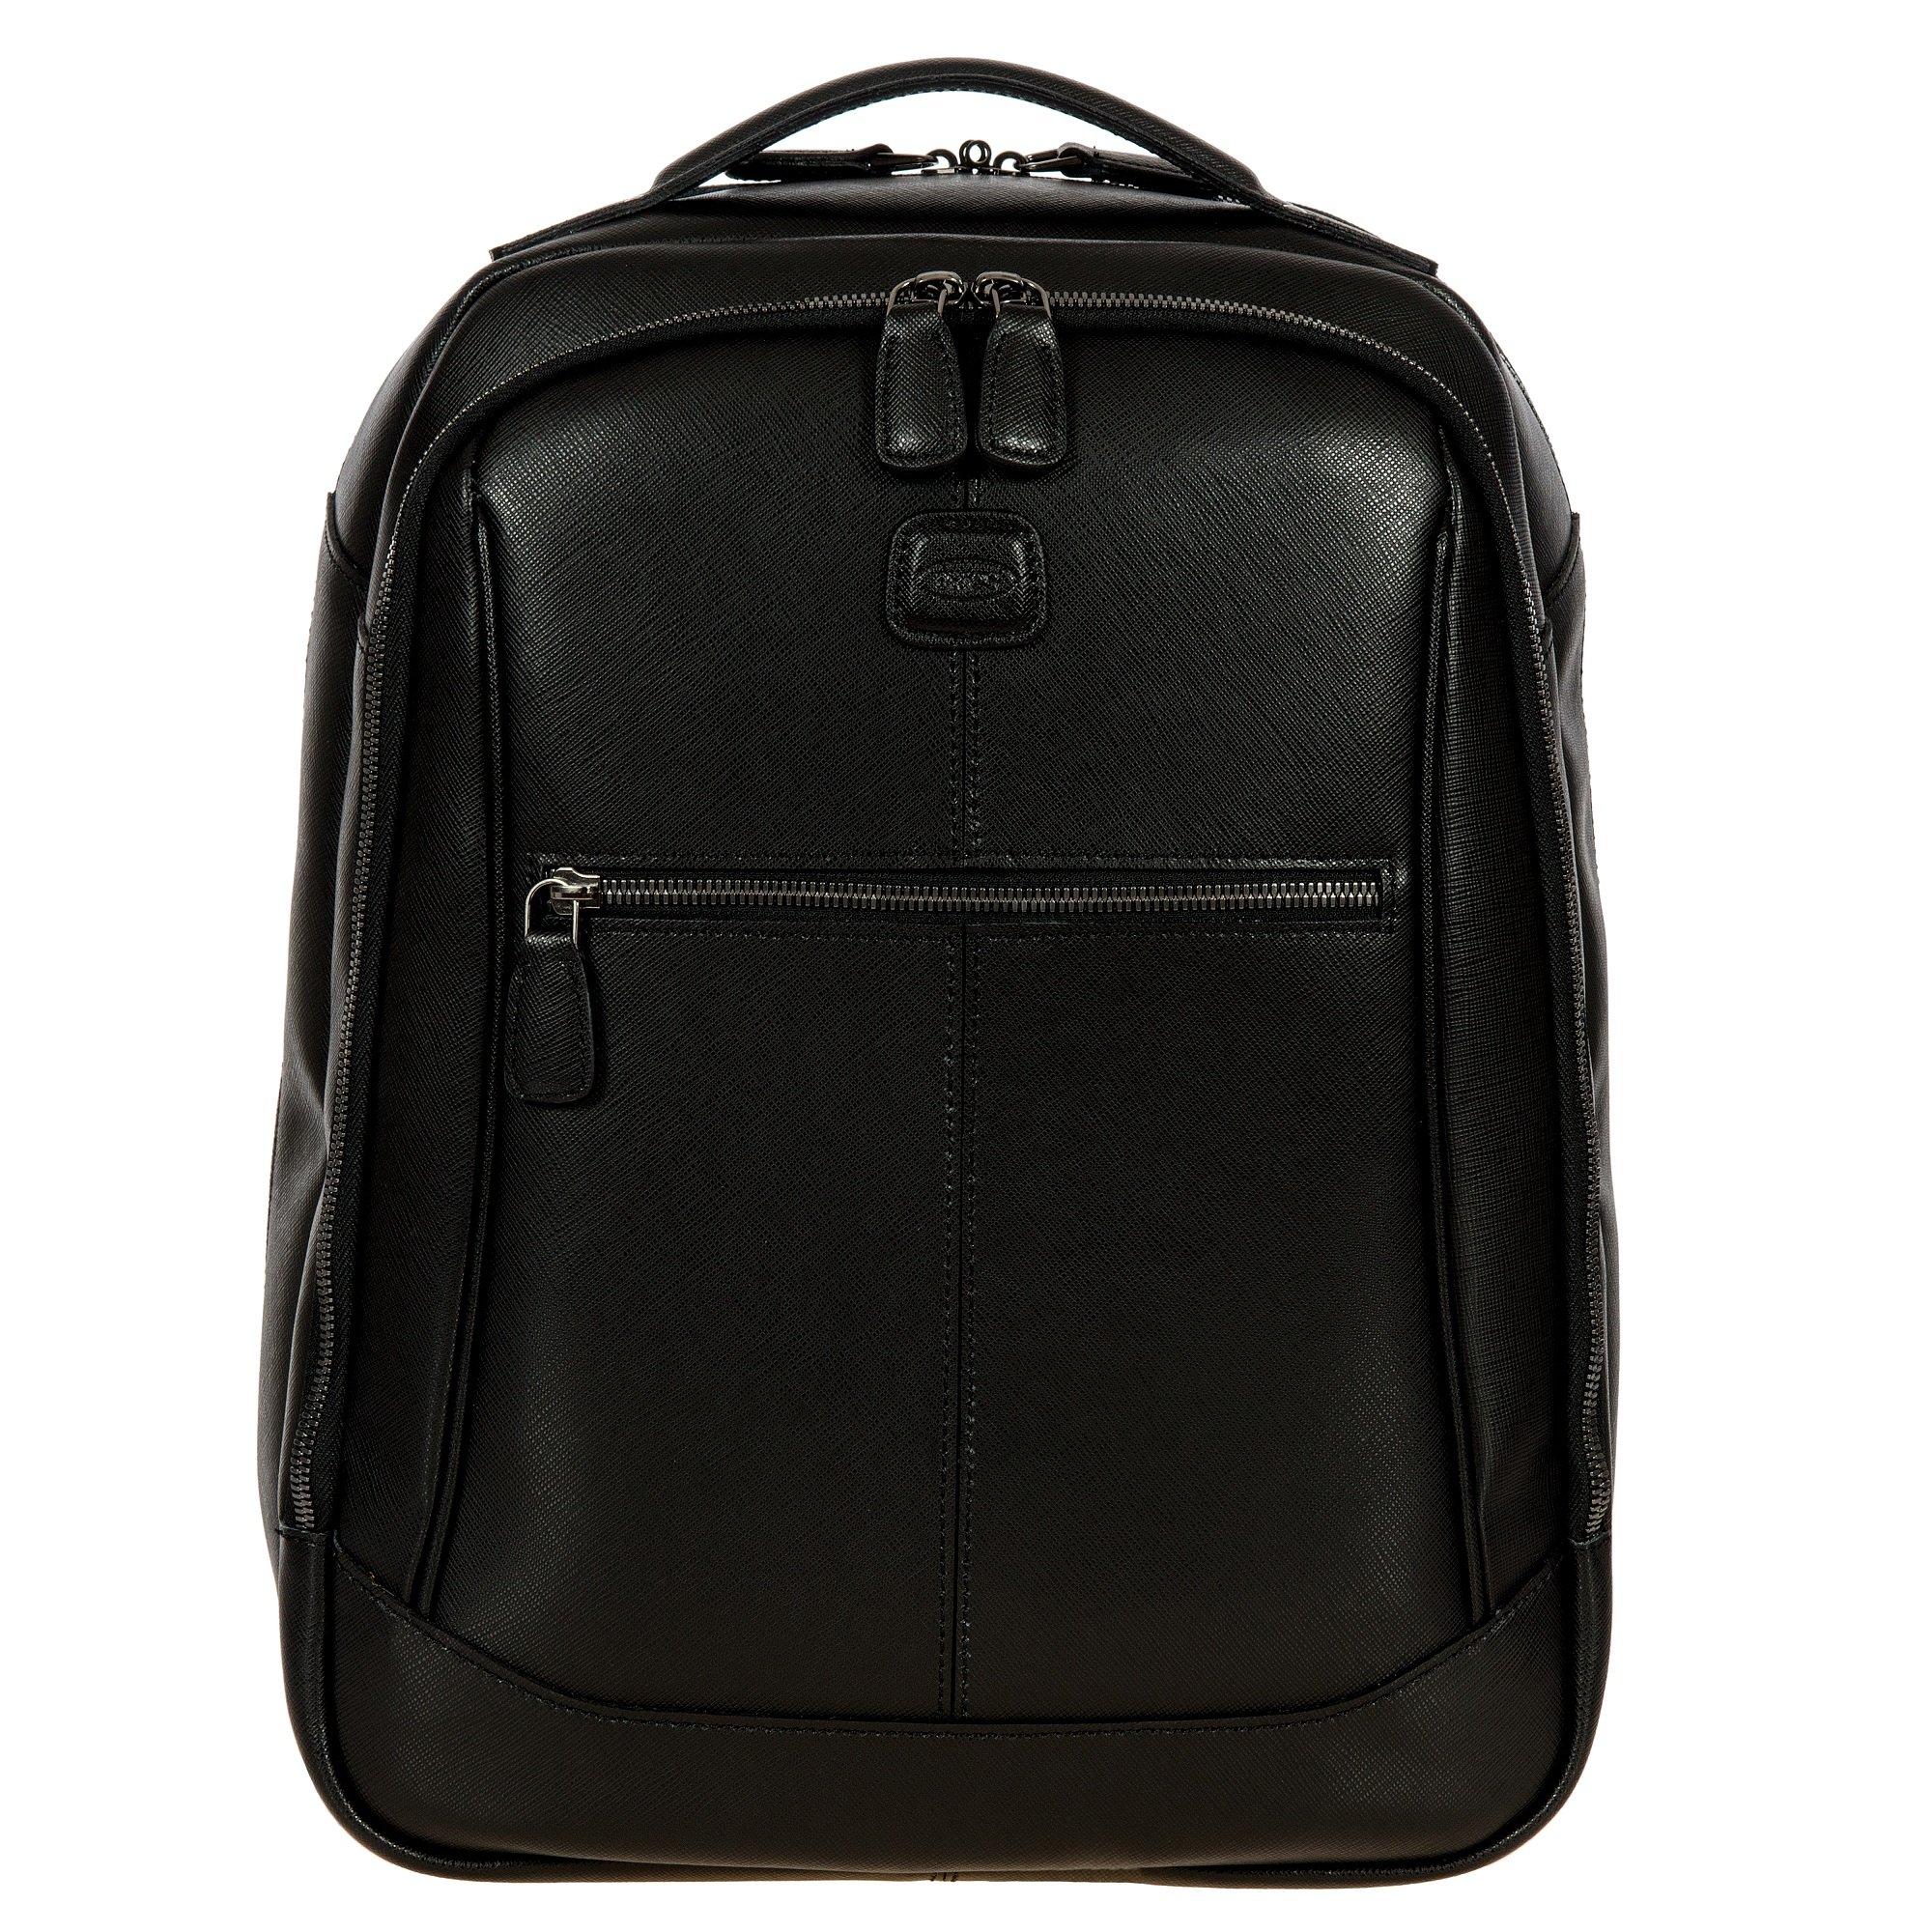 BRIC'S Varese Director Backpack - Medium (Black)